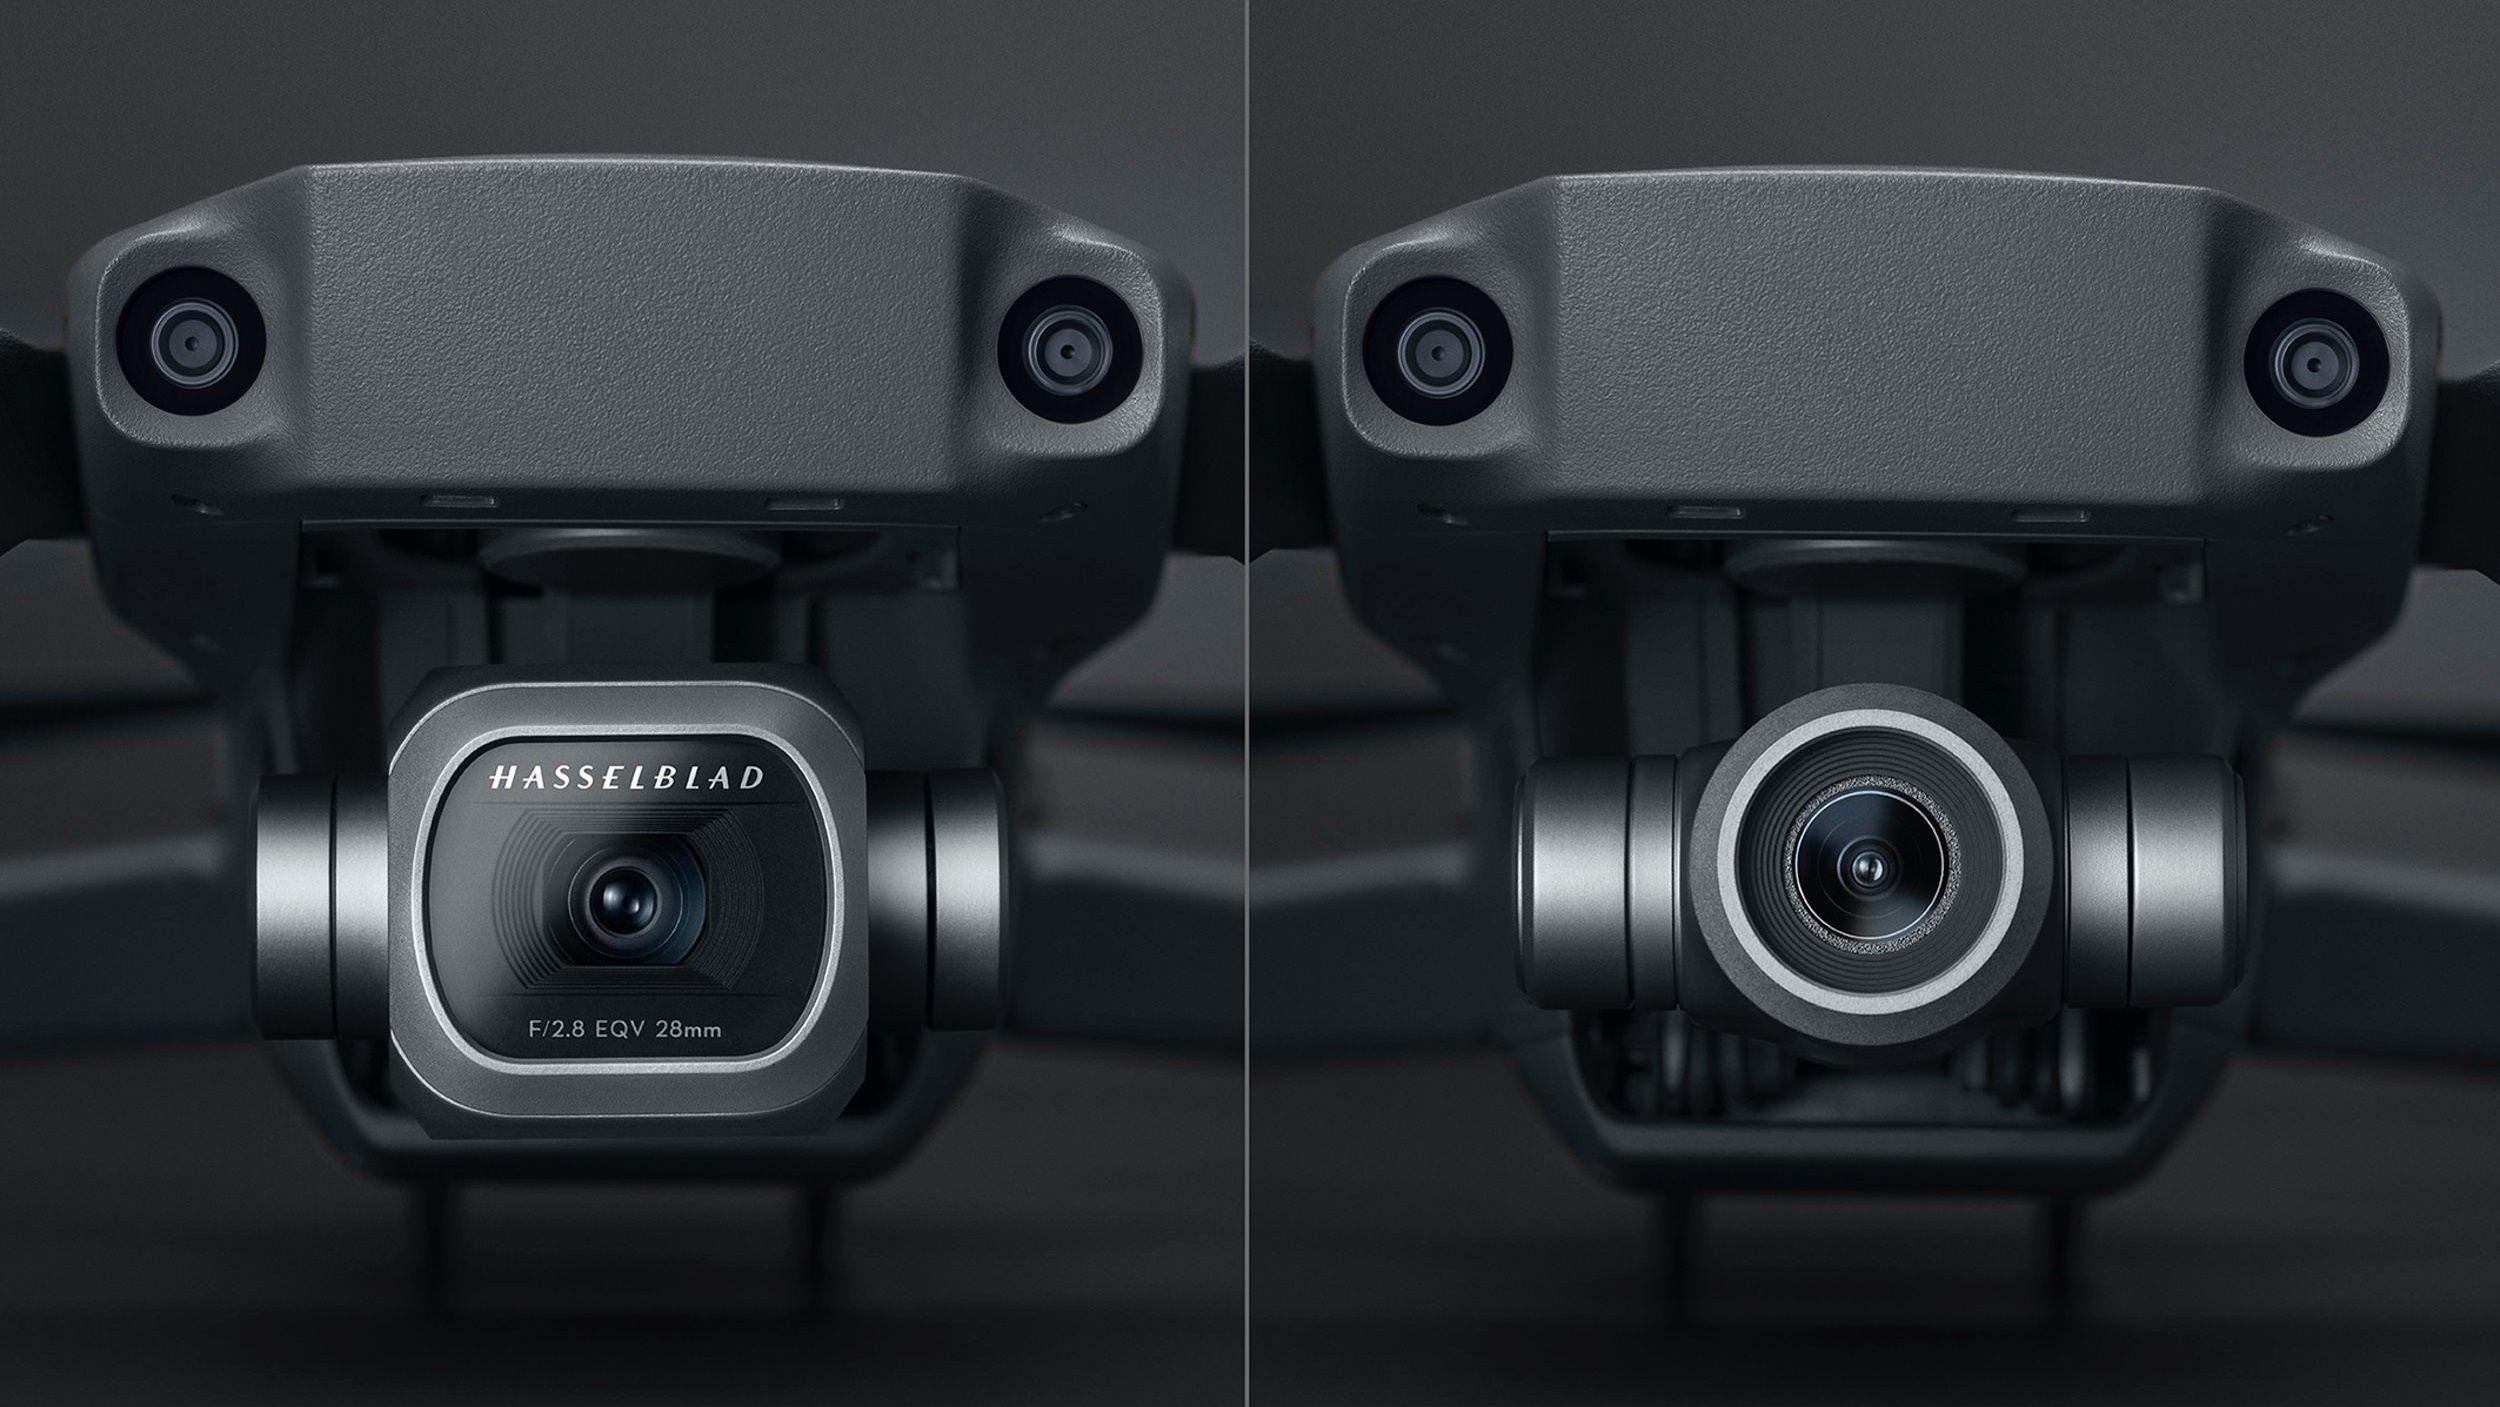 brand new DJI Mavic 2 pro Zoom drone leak highres-1